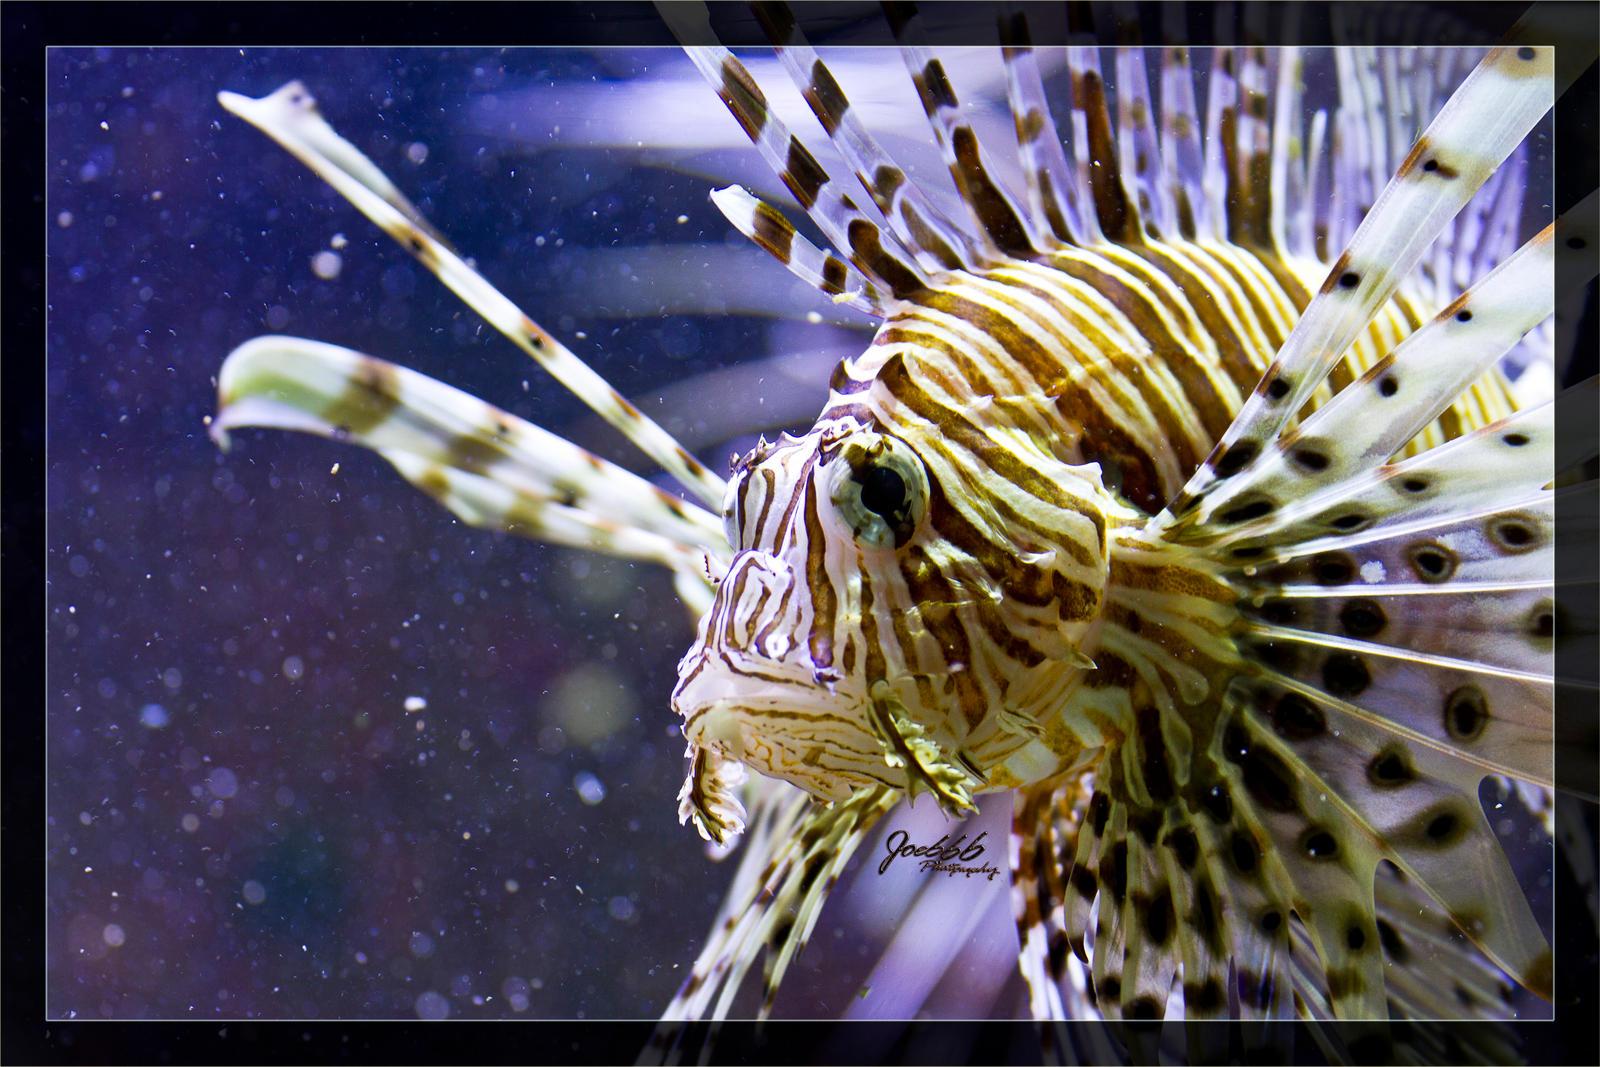 Fire-fish closeup by deaconfrost78